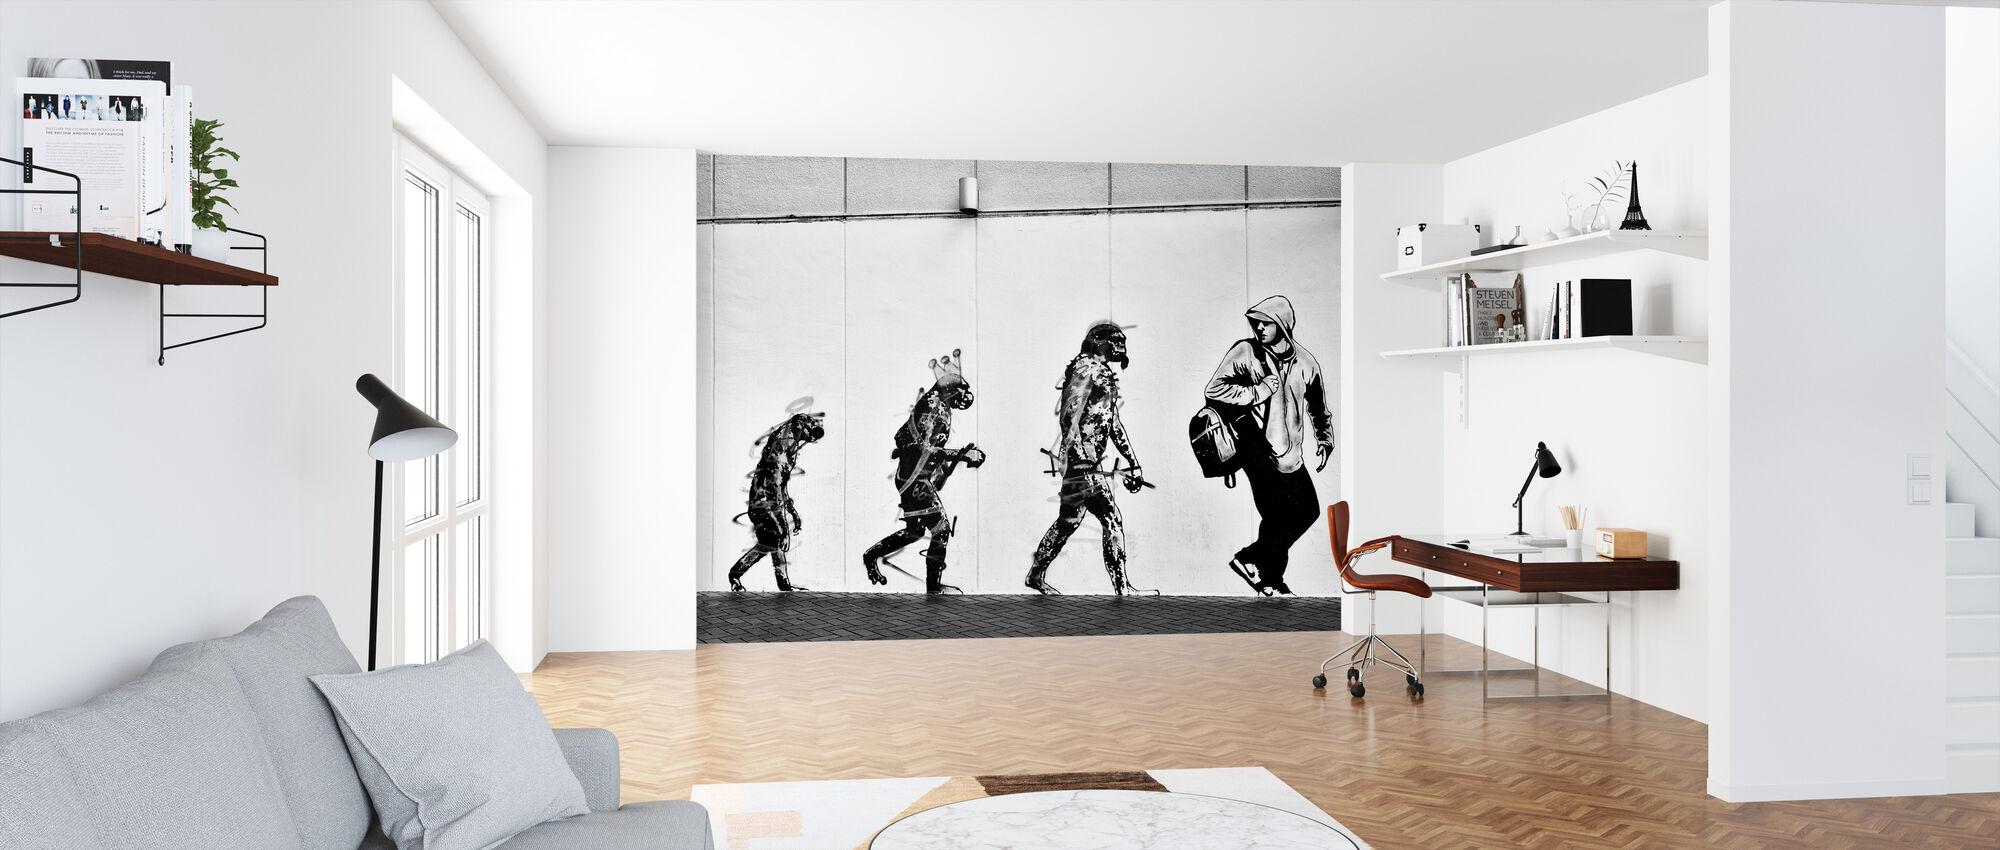 Evolution - Wallpaper - Office